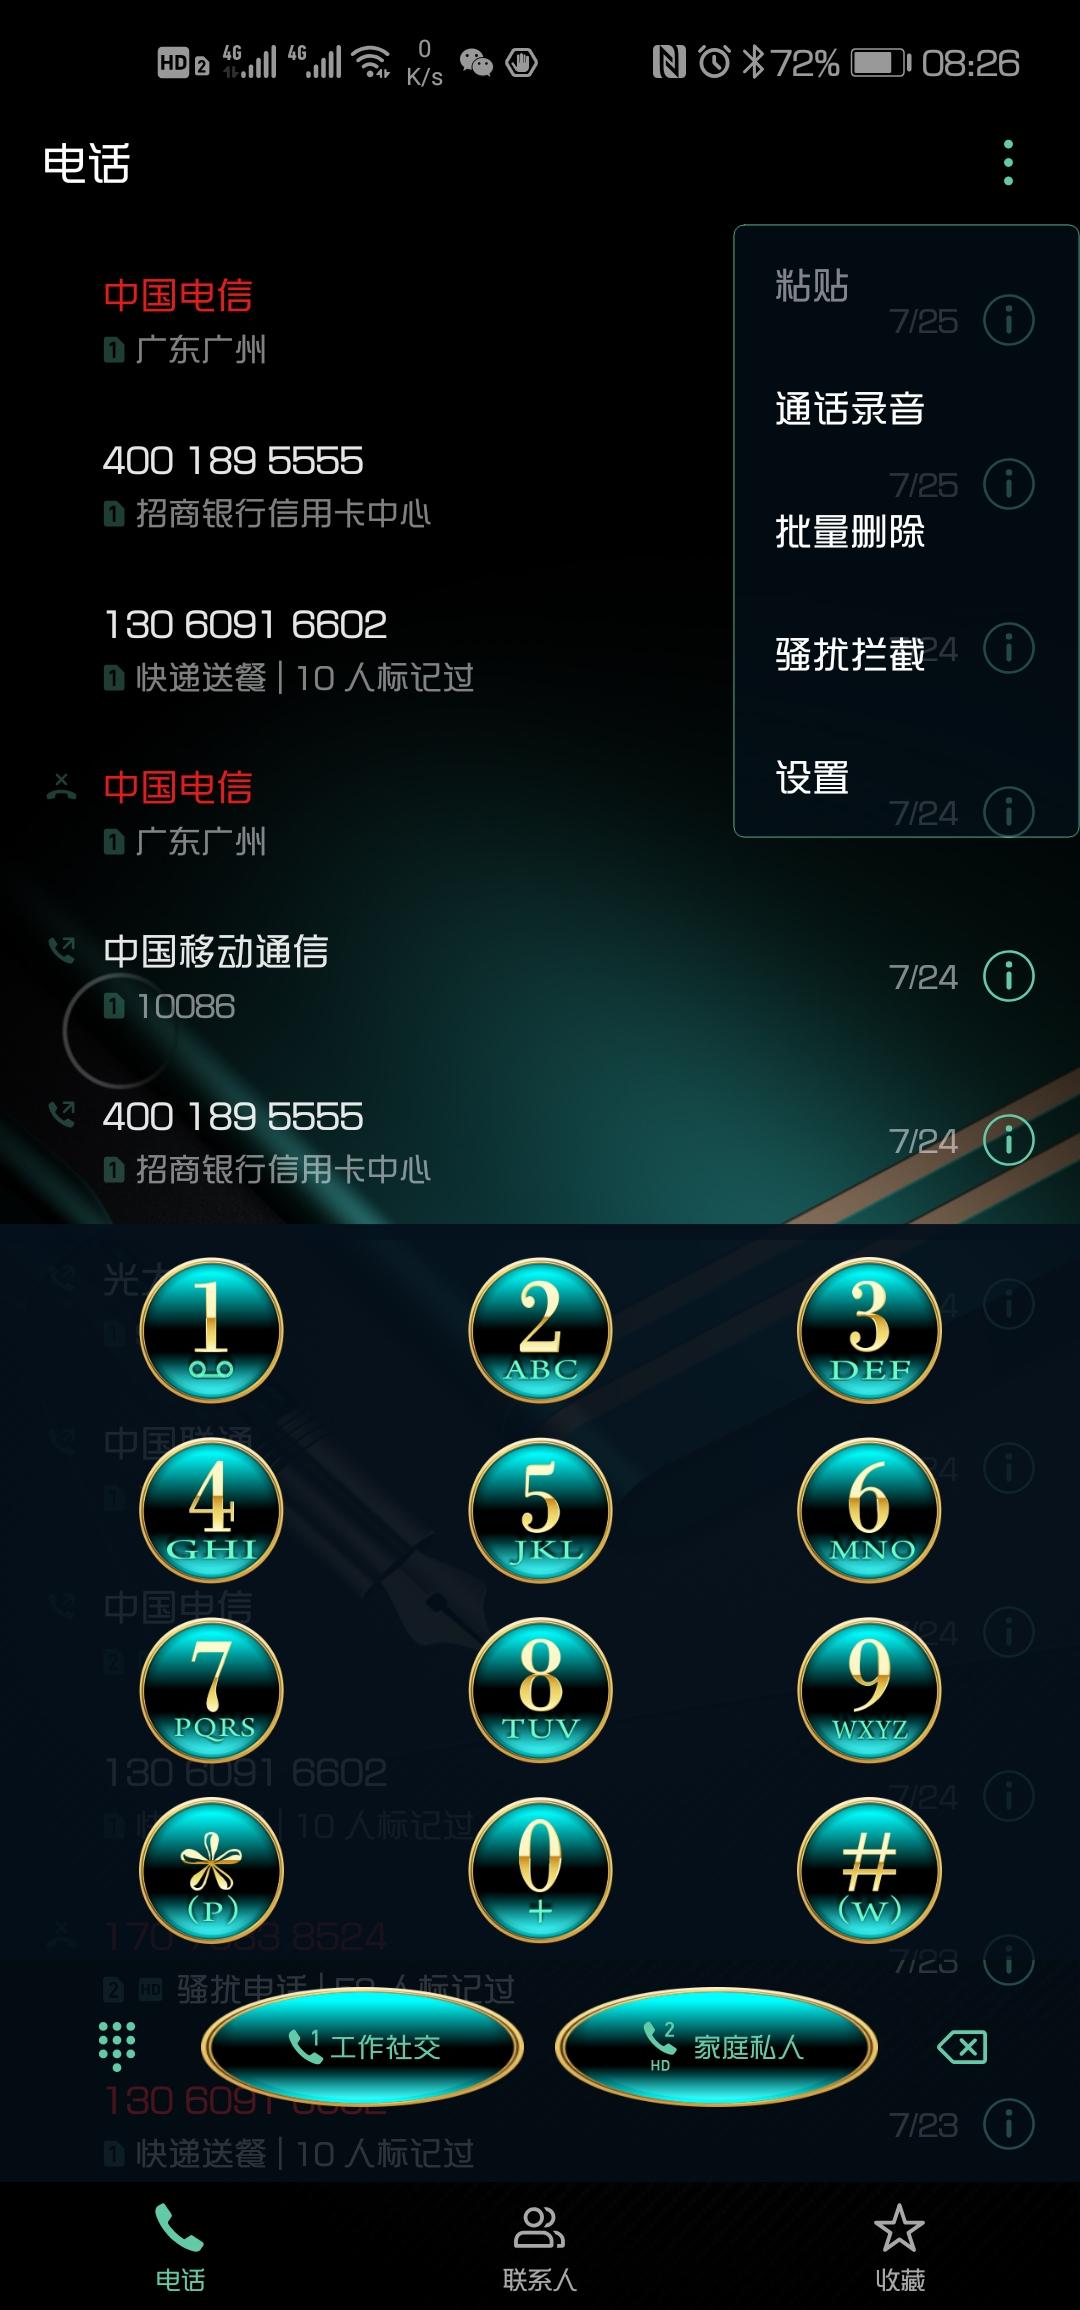 Screenshot_20190807_082627_com.android.contacts.jpg